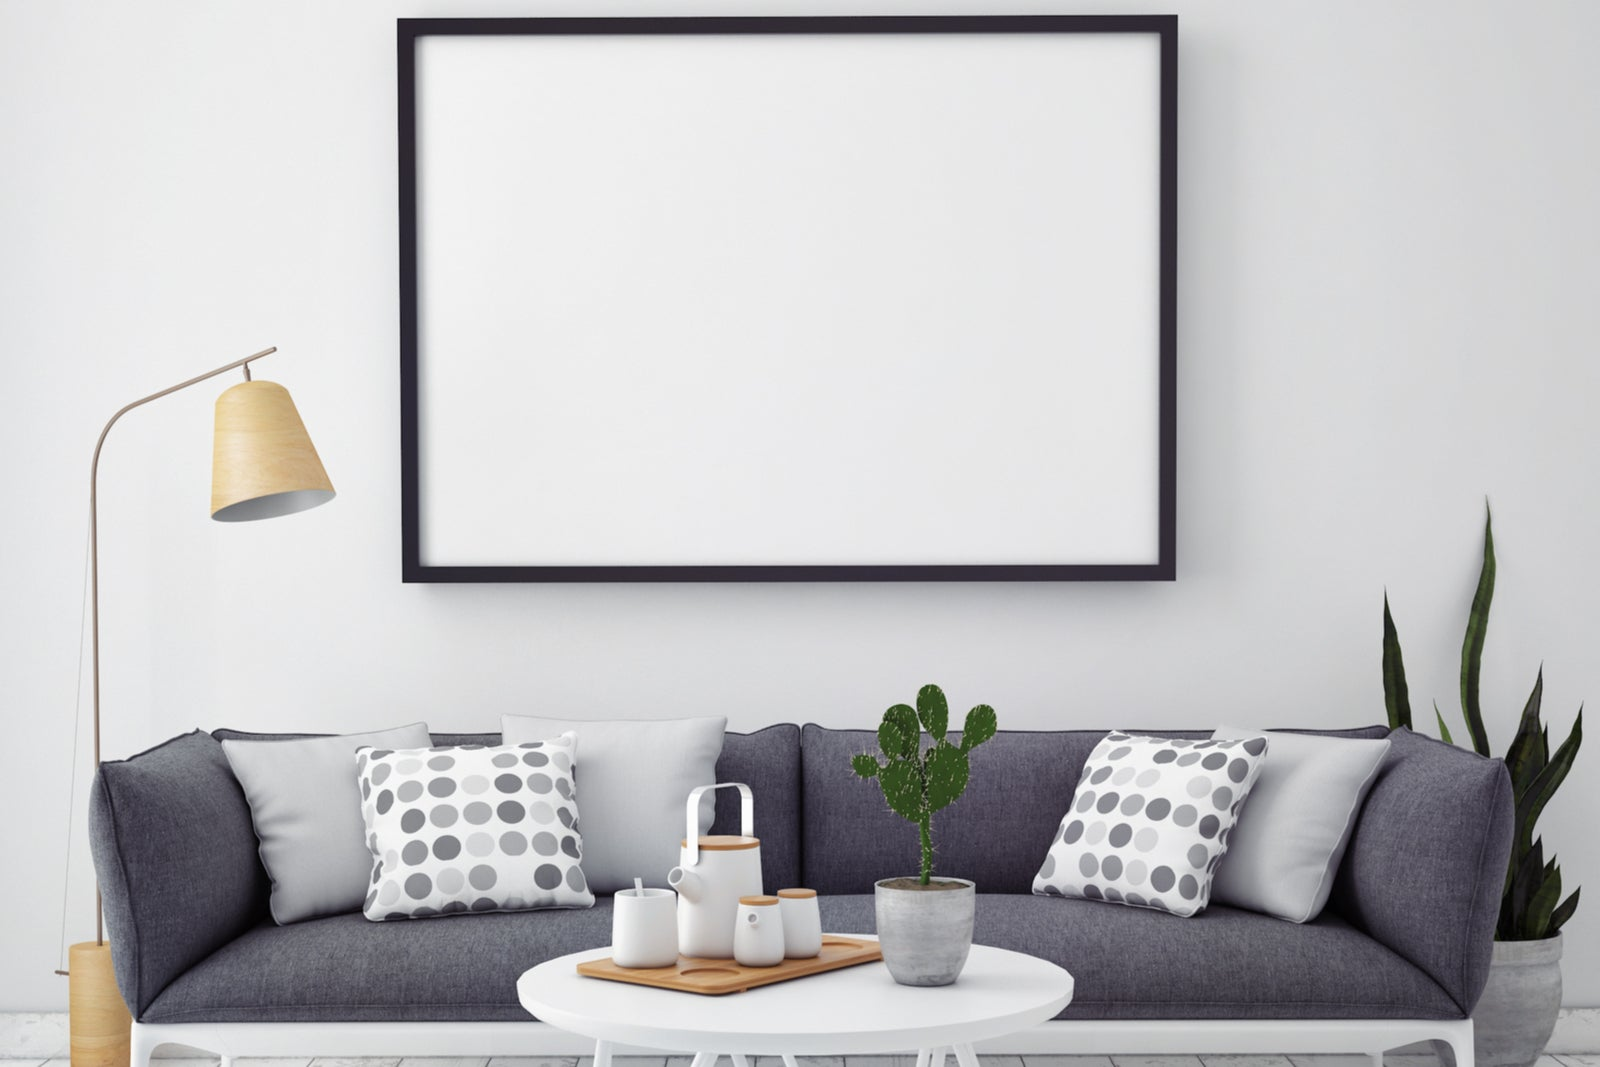 5 ideas para decorar tu casa con fotos: grandes, pequeñas, redondas...